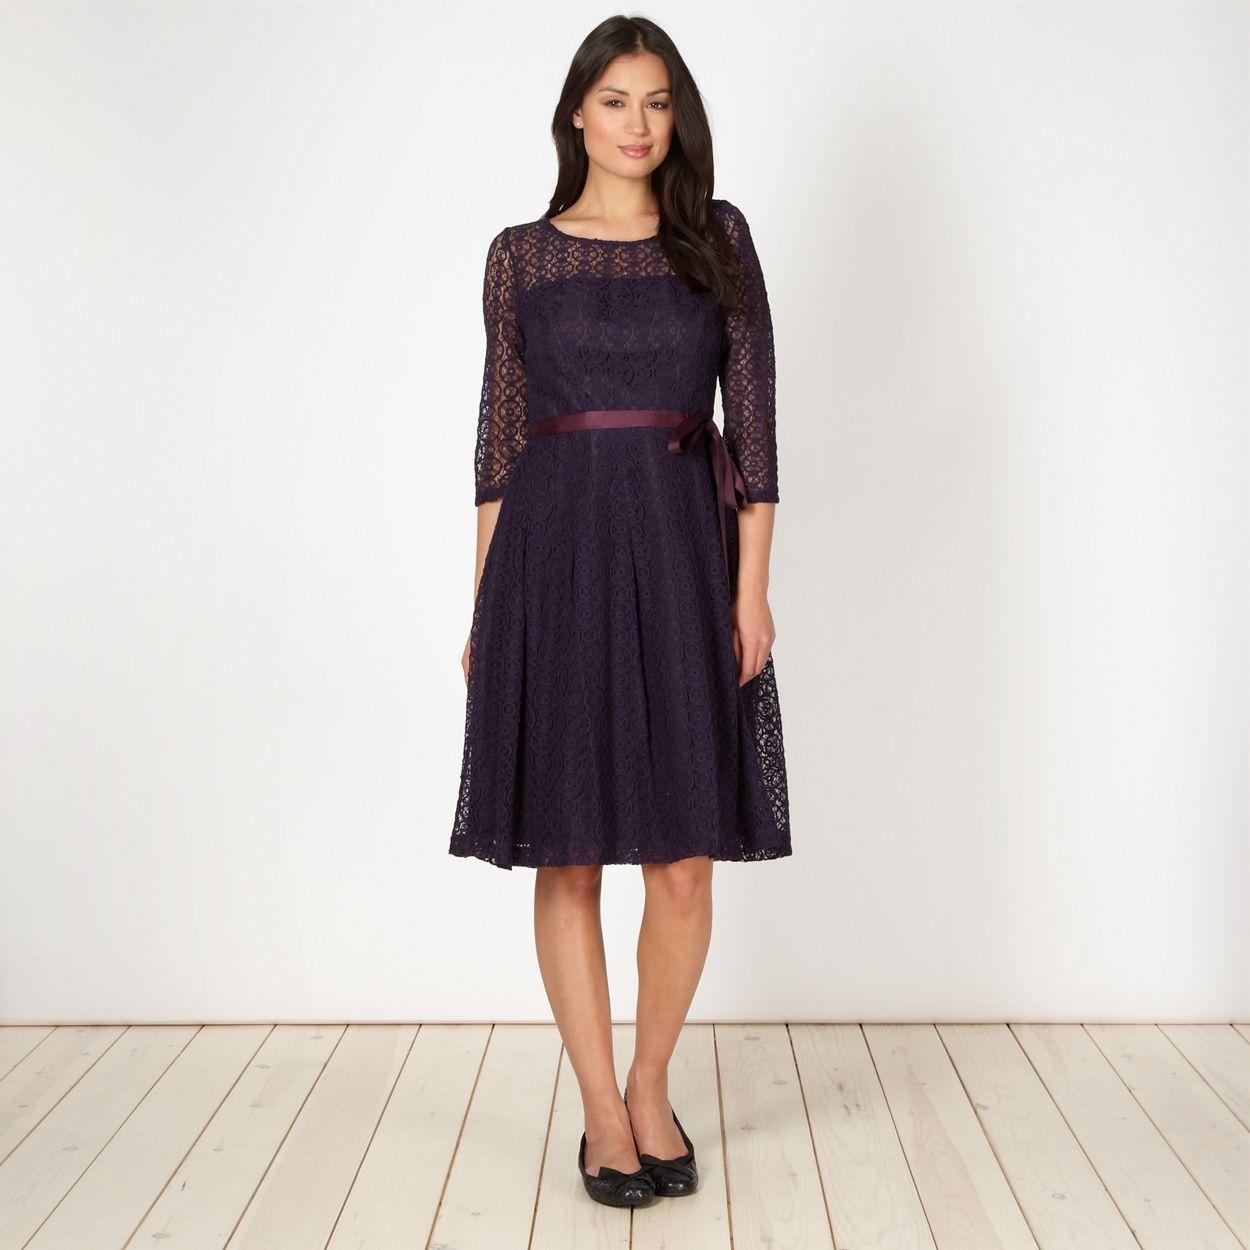 Betty jacksonblack designer dark purple lace prom dress at